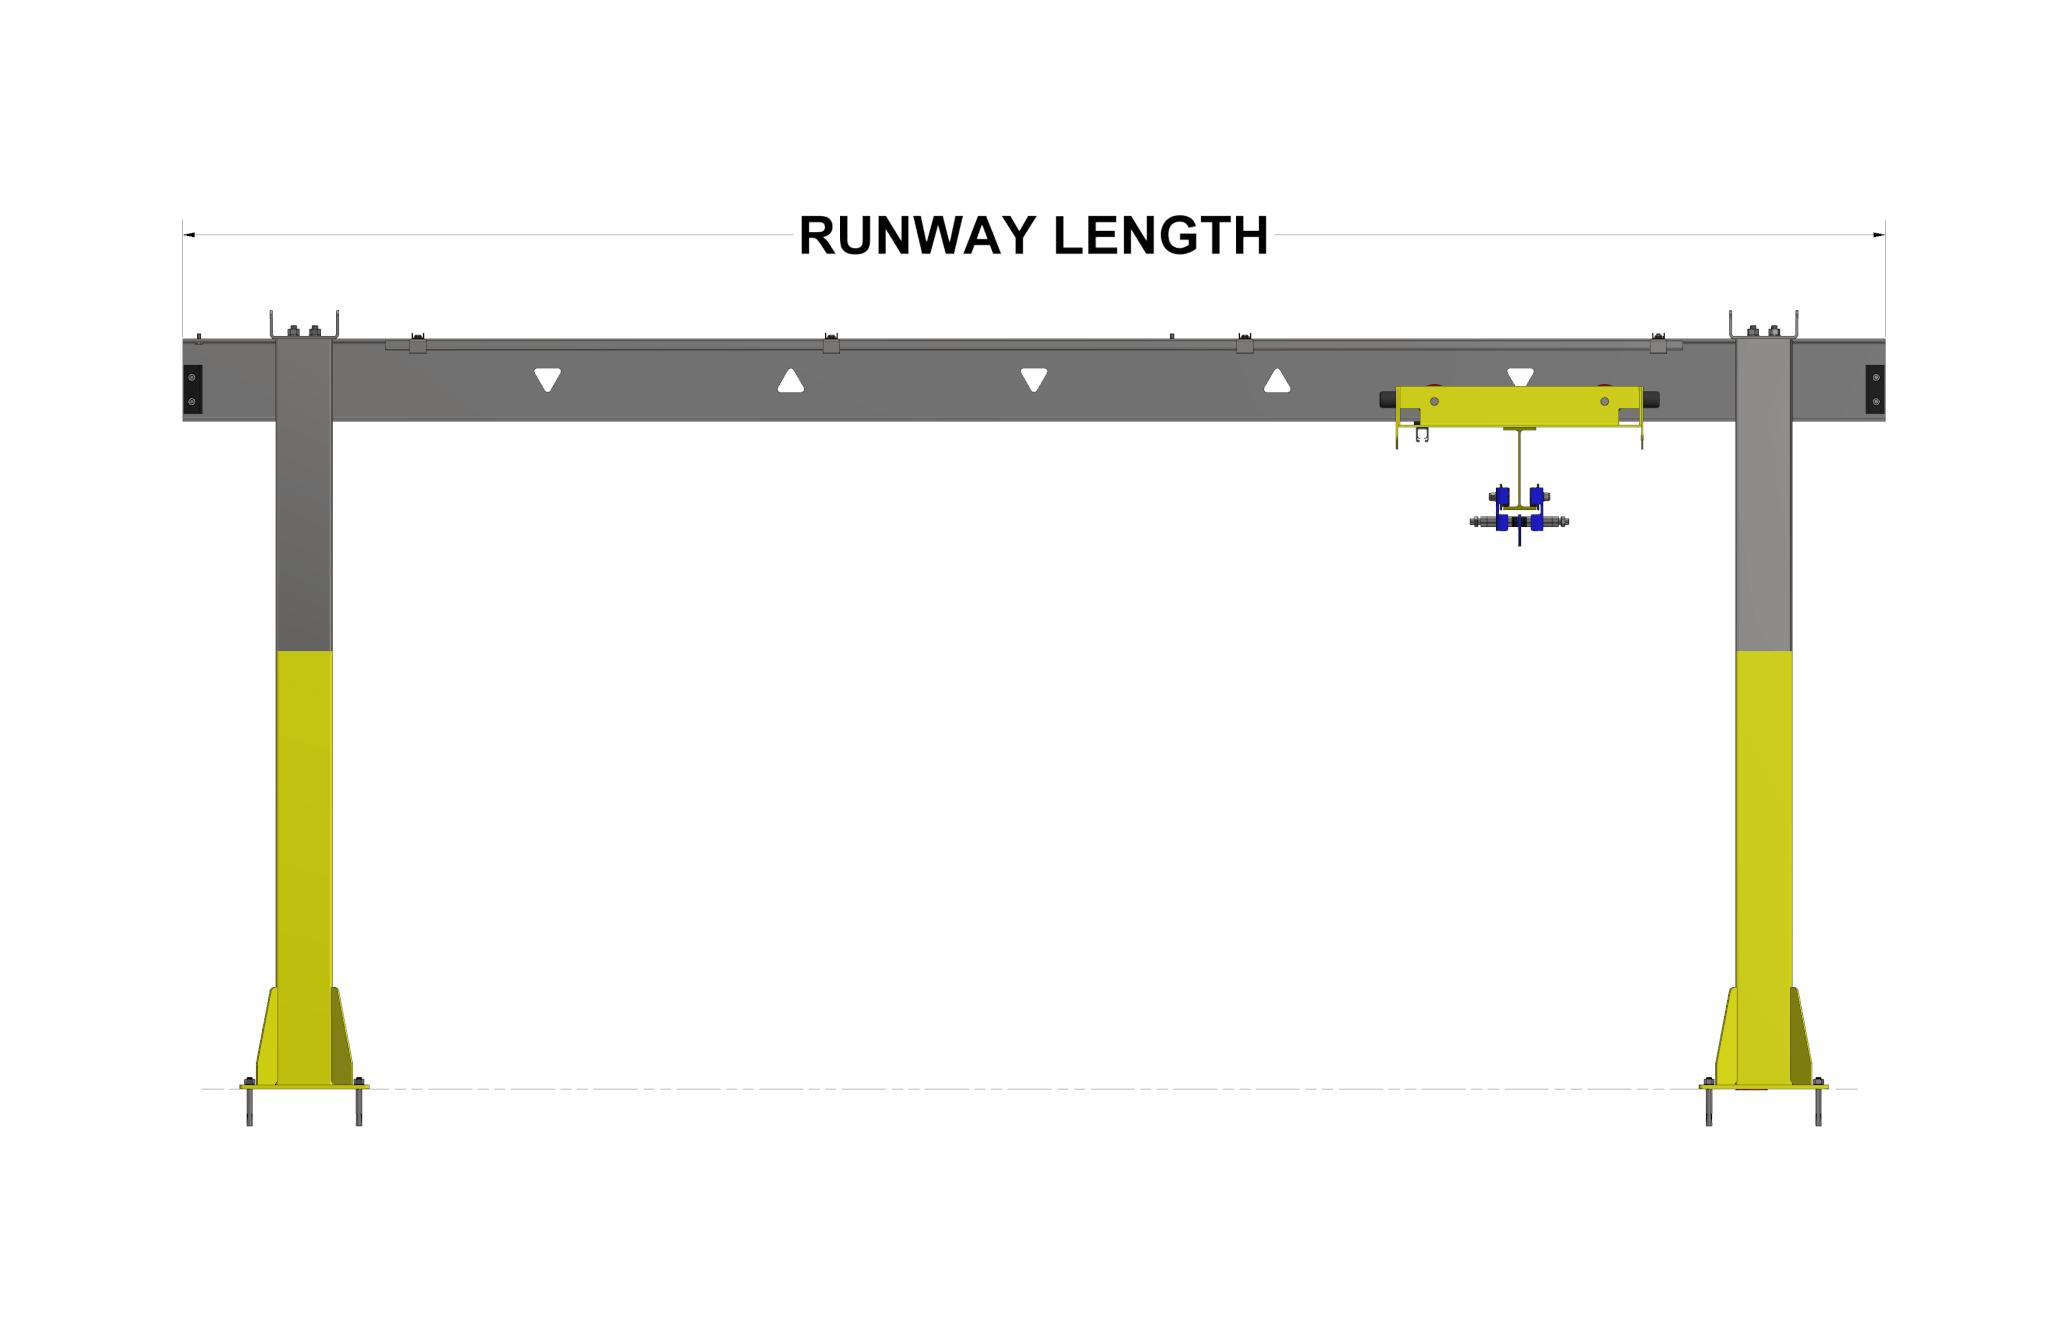 pwi ultra-lite freestanding bridge crane overall system length